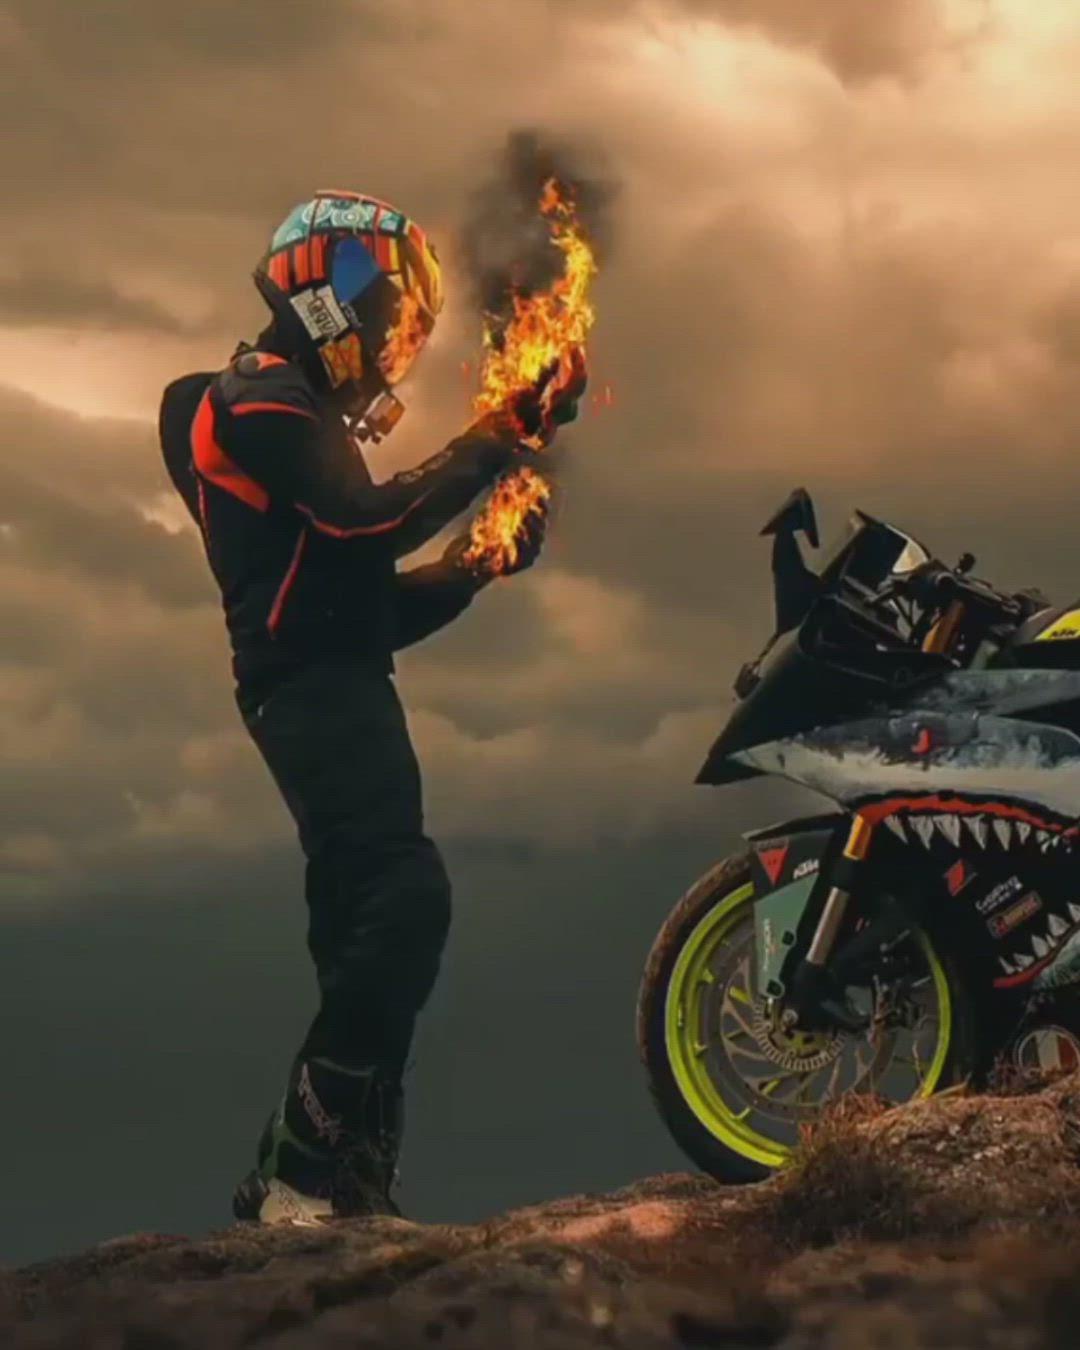 Biker S Edit Video In 2021 Lonely Art Best Background Images Background Images Get ktm duke couple wallpaper png